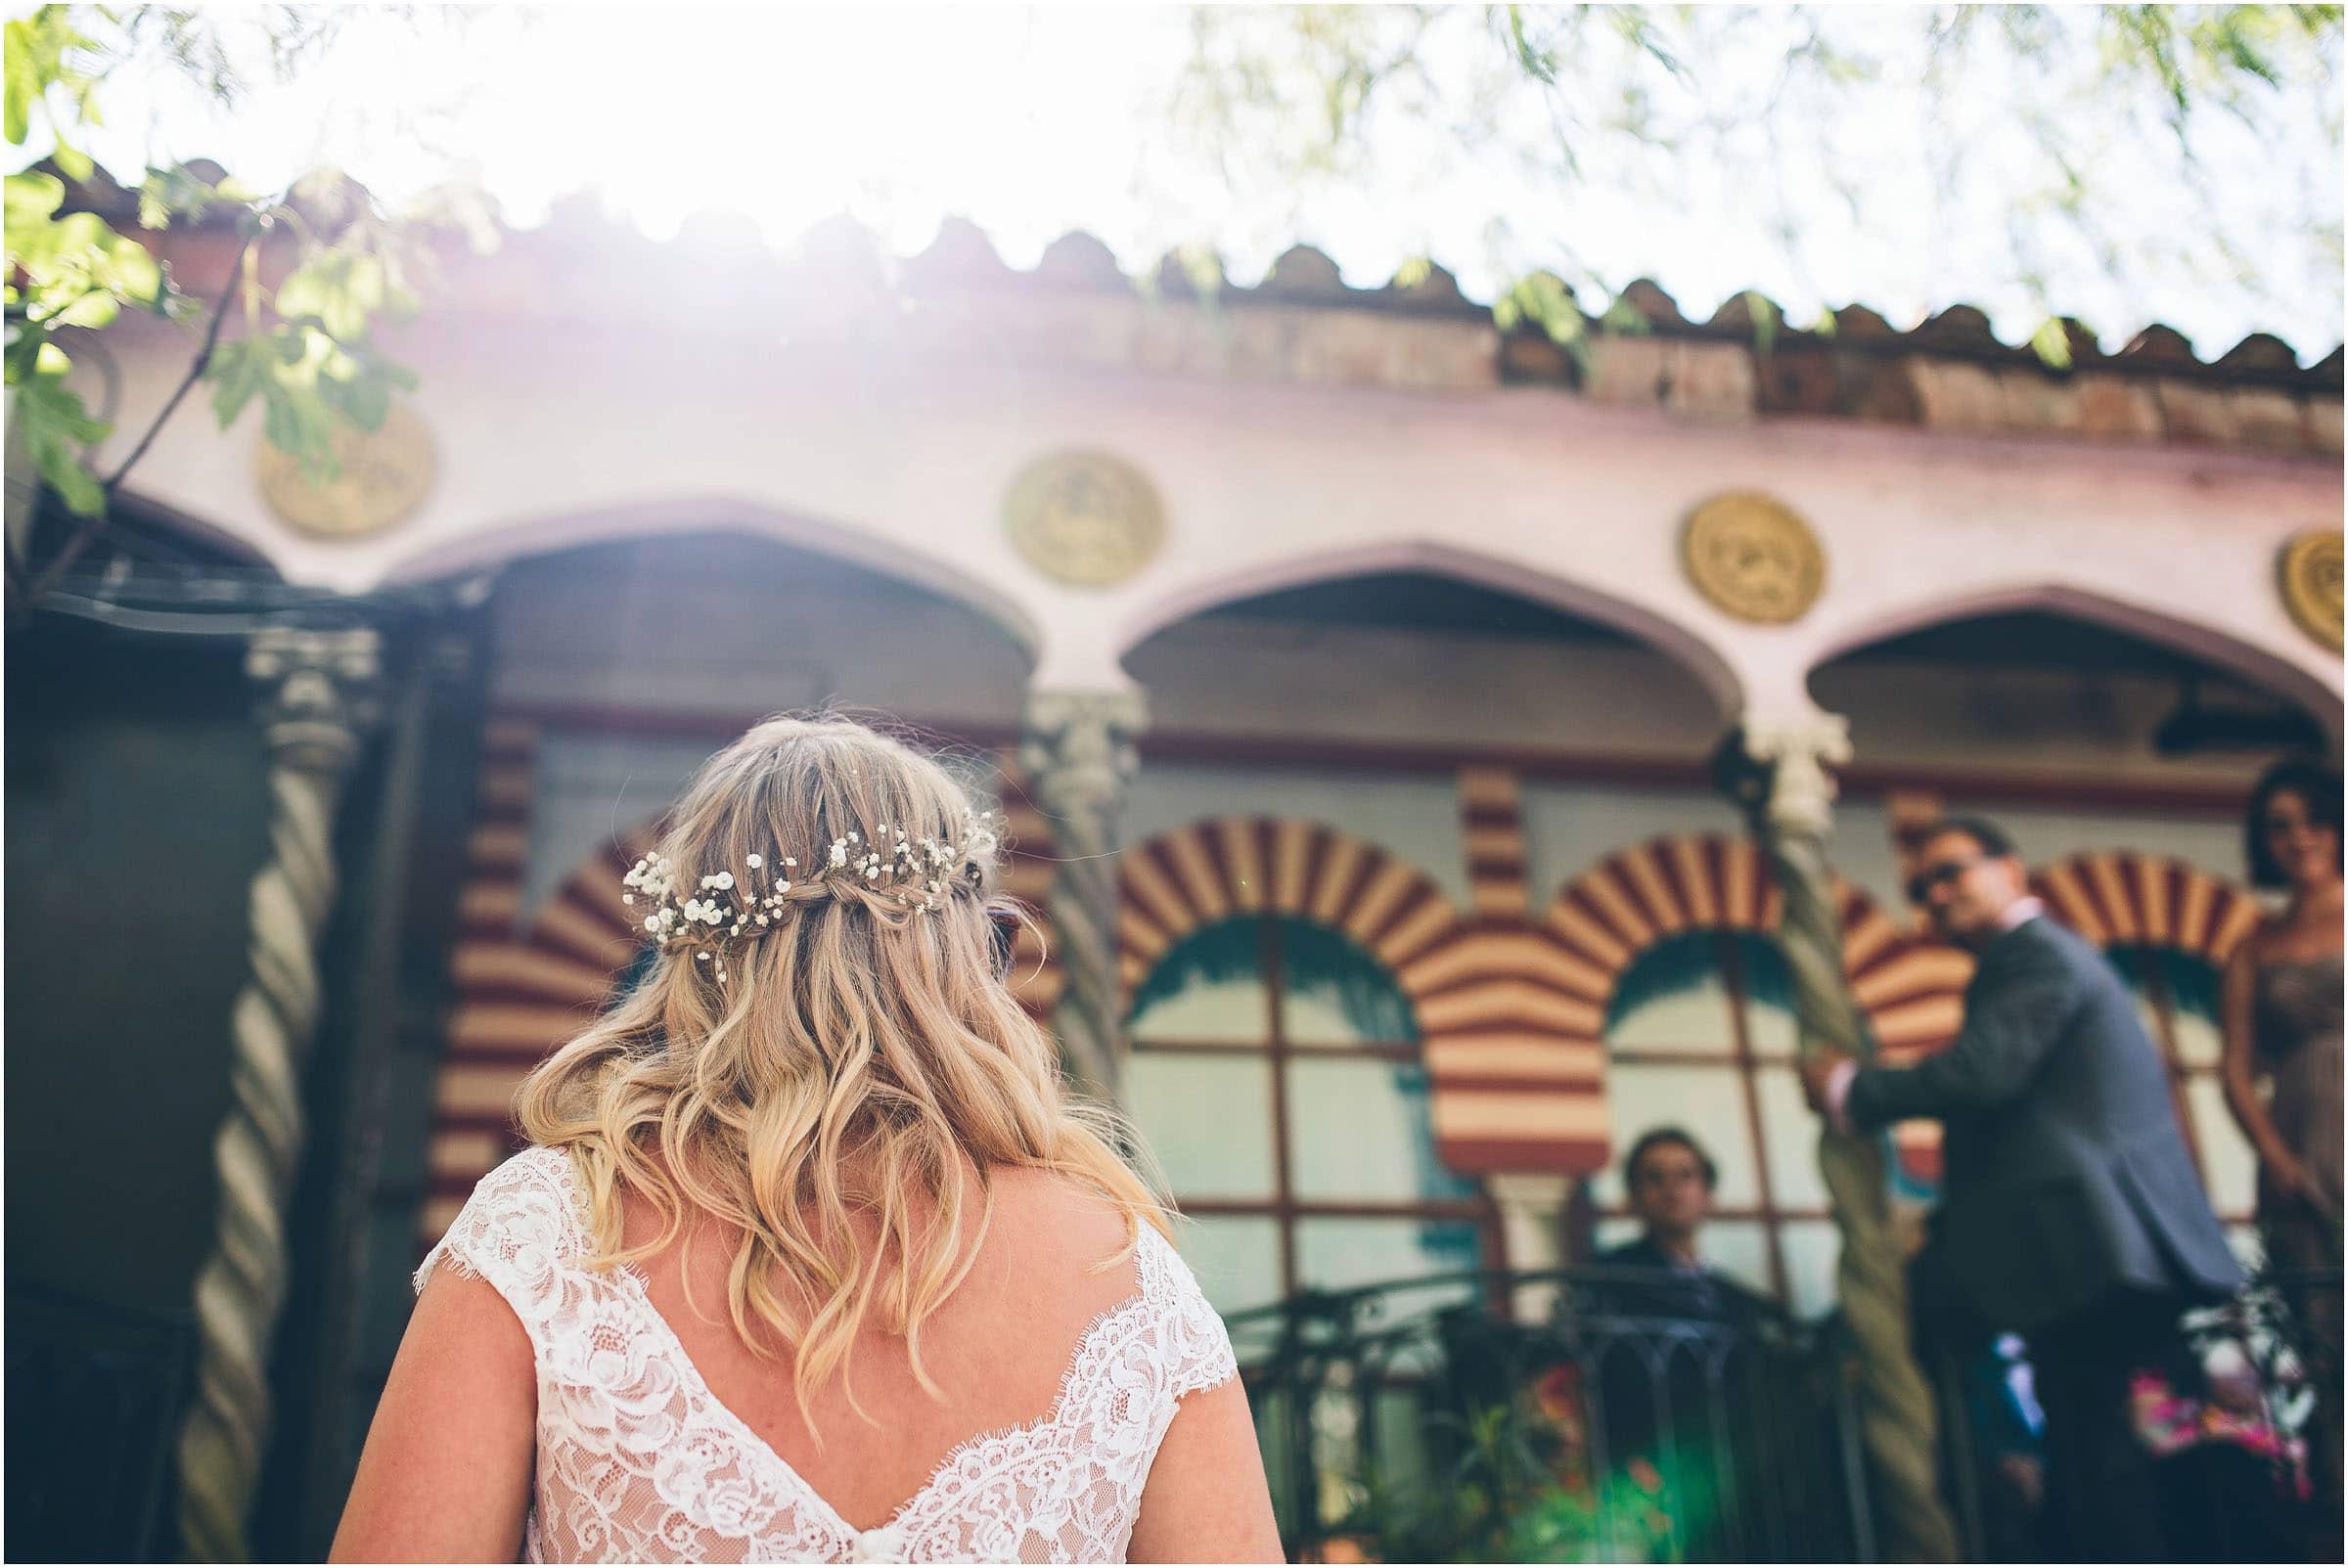 Kensington_Roof_Gardens_Wedding_Photography_0053